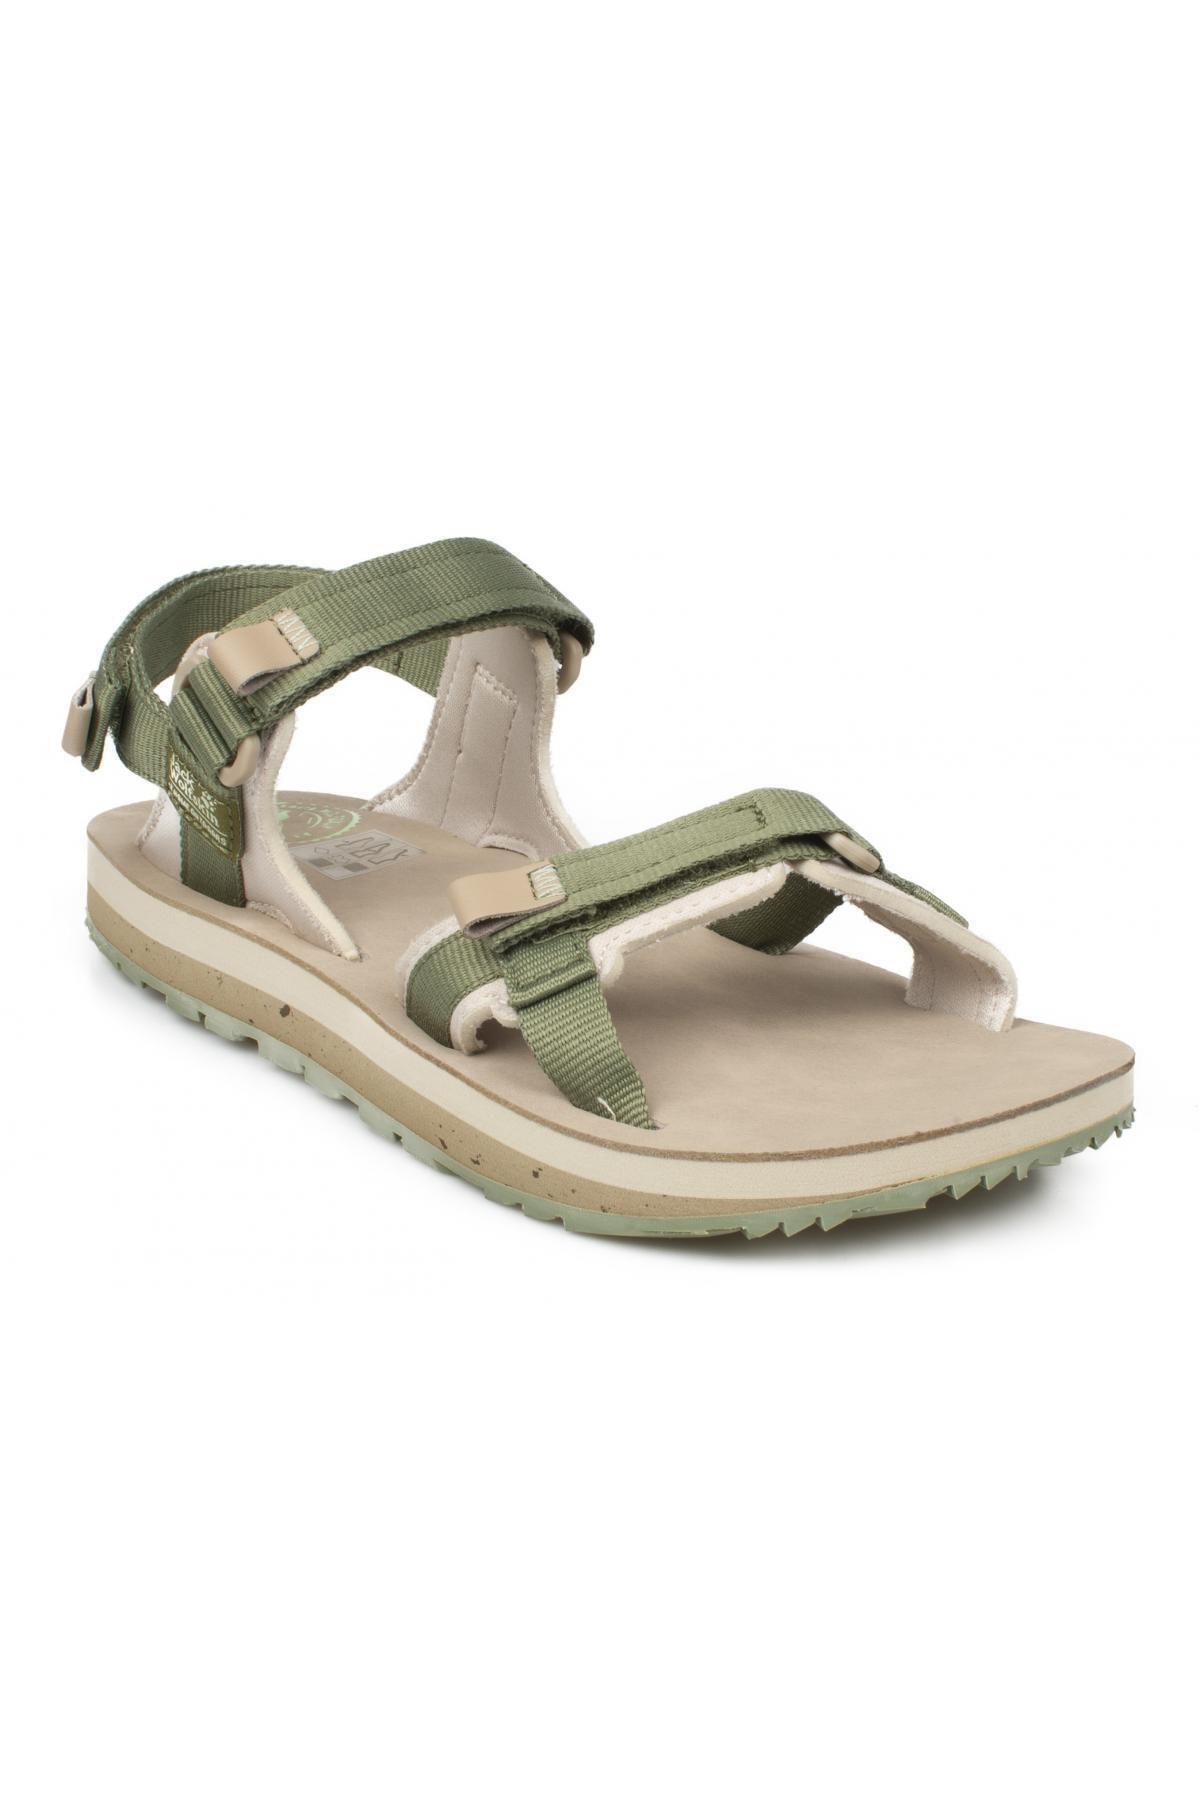 Jack Wolfskin 4039451 Z Outfresh Deluxe Sandal W Kadın Sandalet 1